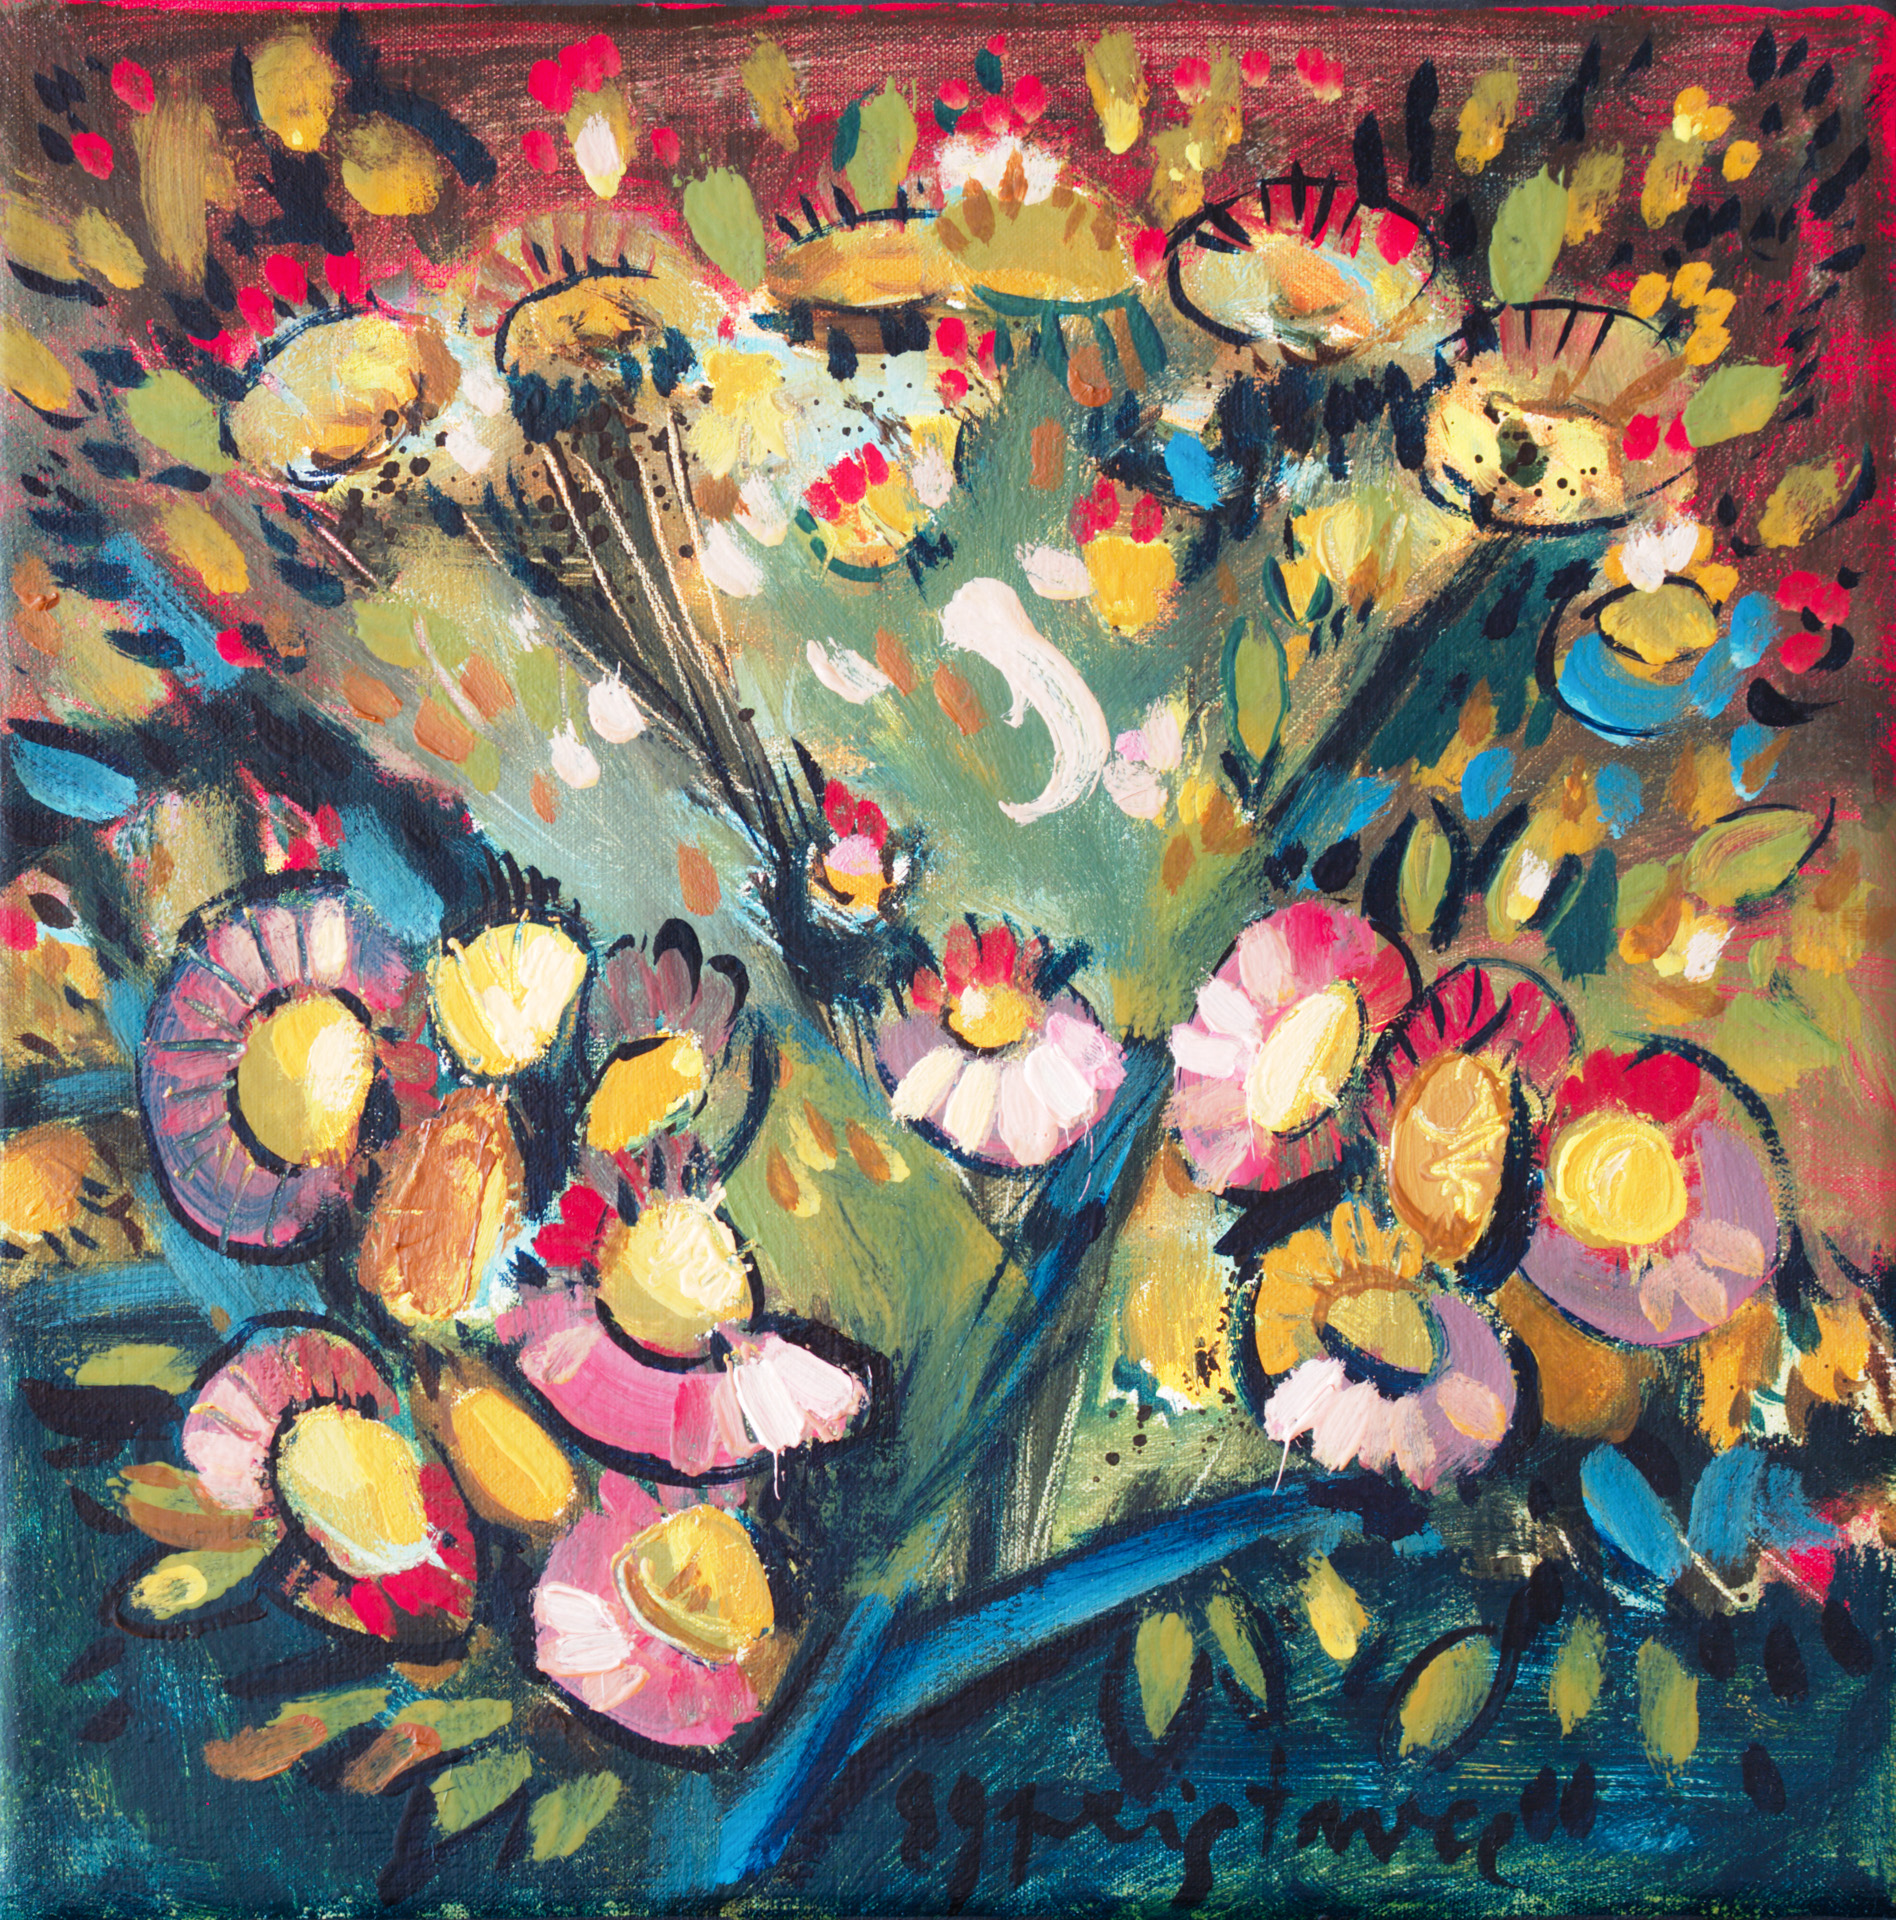 Still Life IV / 1989 / oil on canvas / 30x30 cm